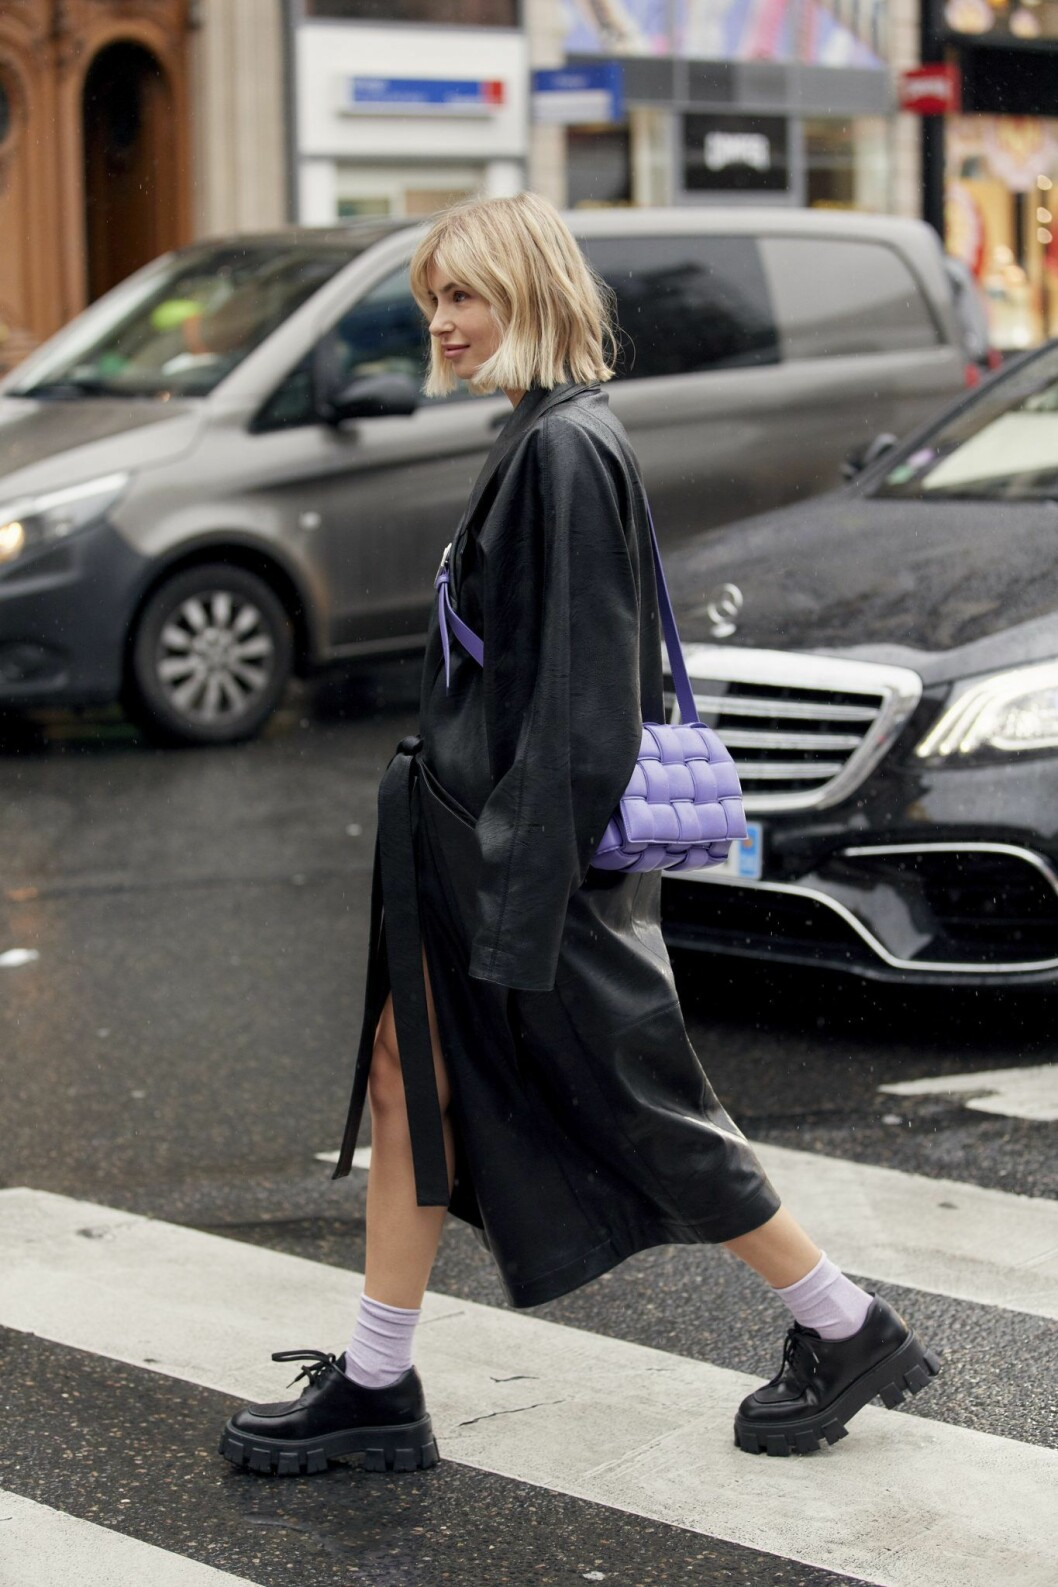 Lila väska från Bottega Veneta Streetstyle Paris Fashion Week AW20.